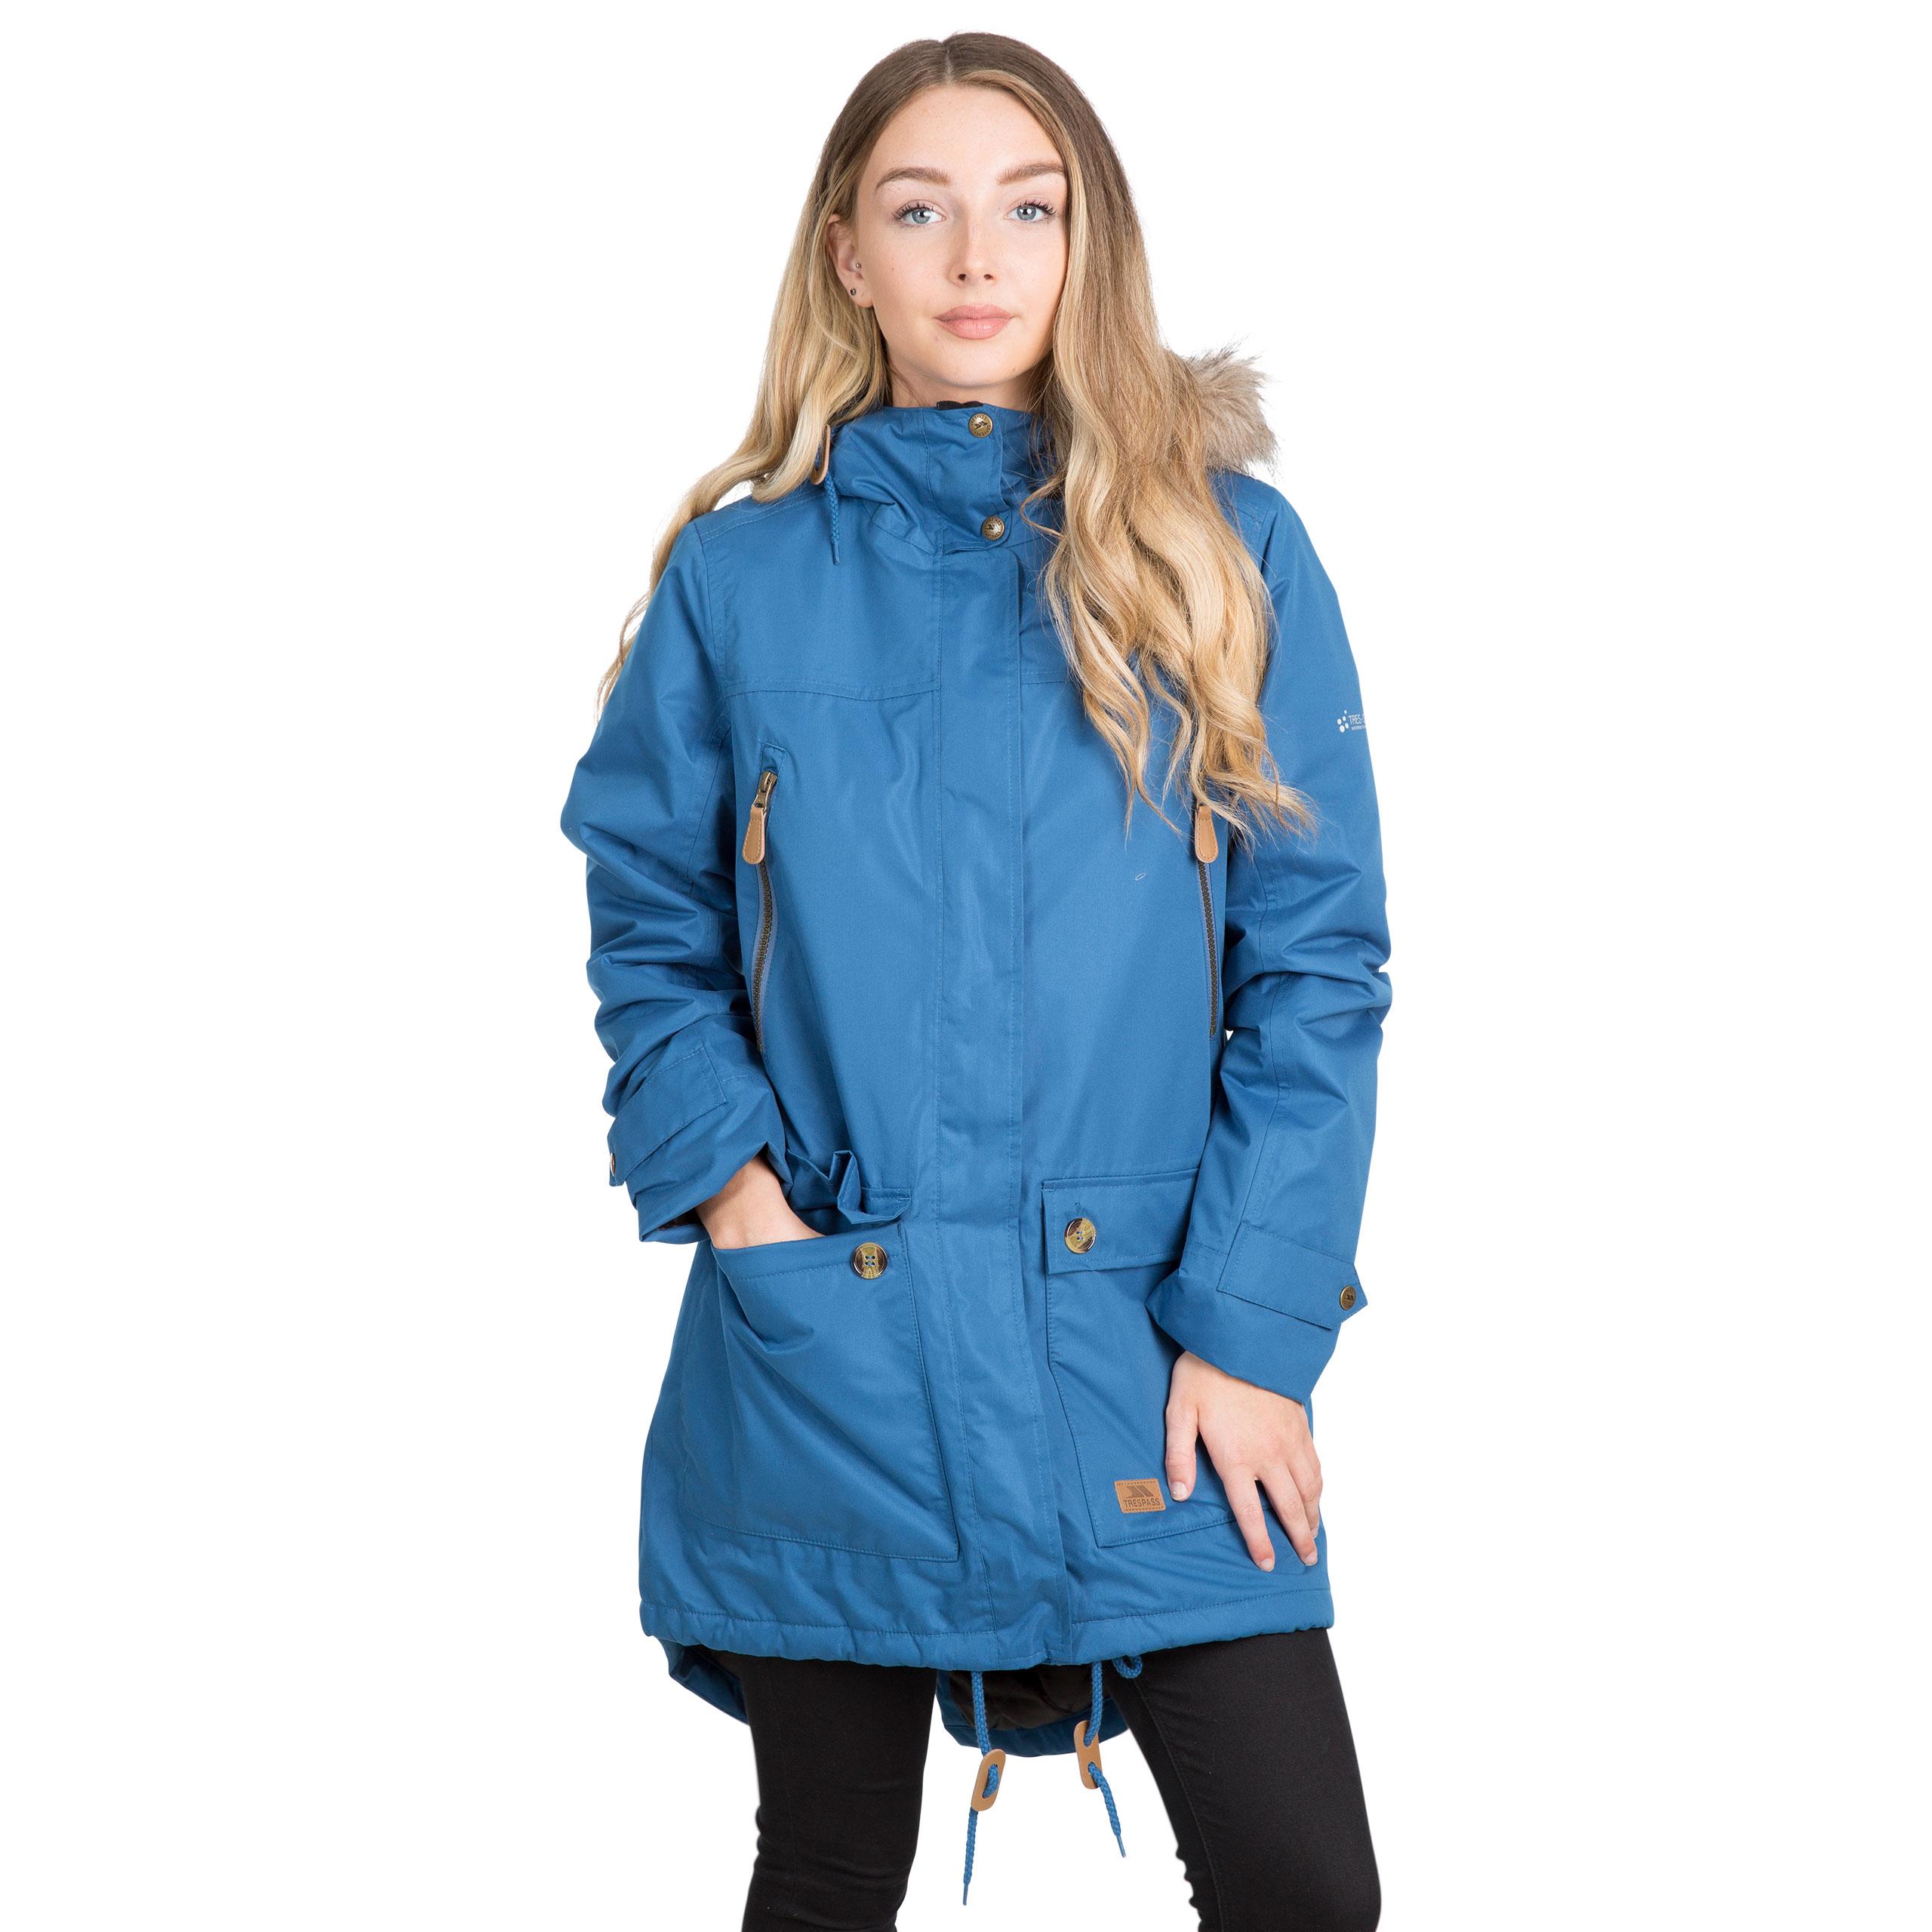 Trespass-Clea-Womens-Waterproof-Jacket-Ladies-Long-Rain-Coat-with-Hood thumbnail 17